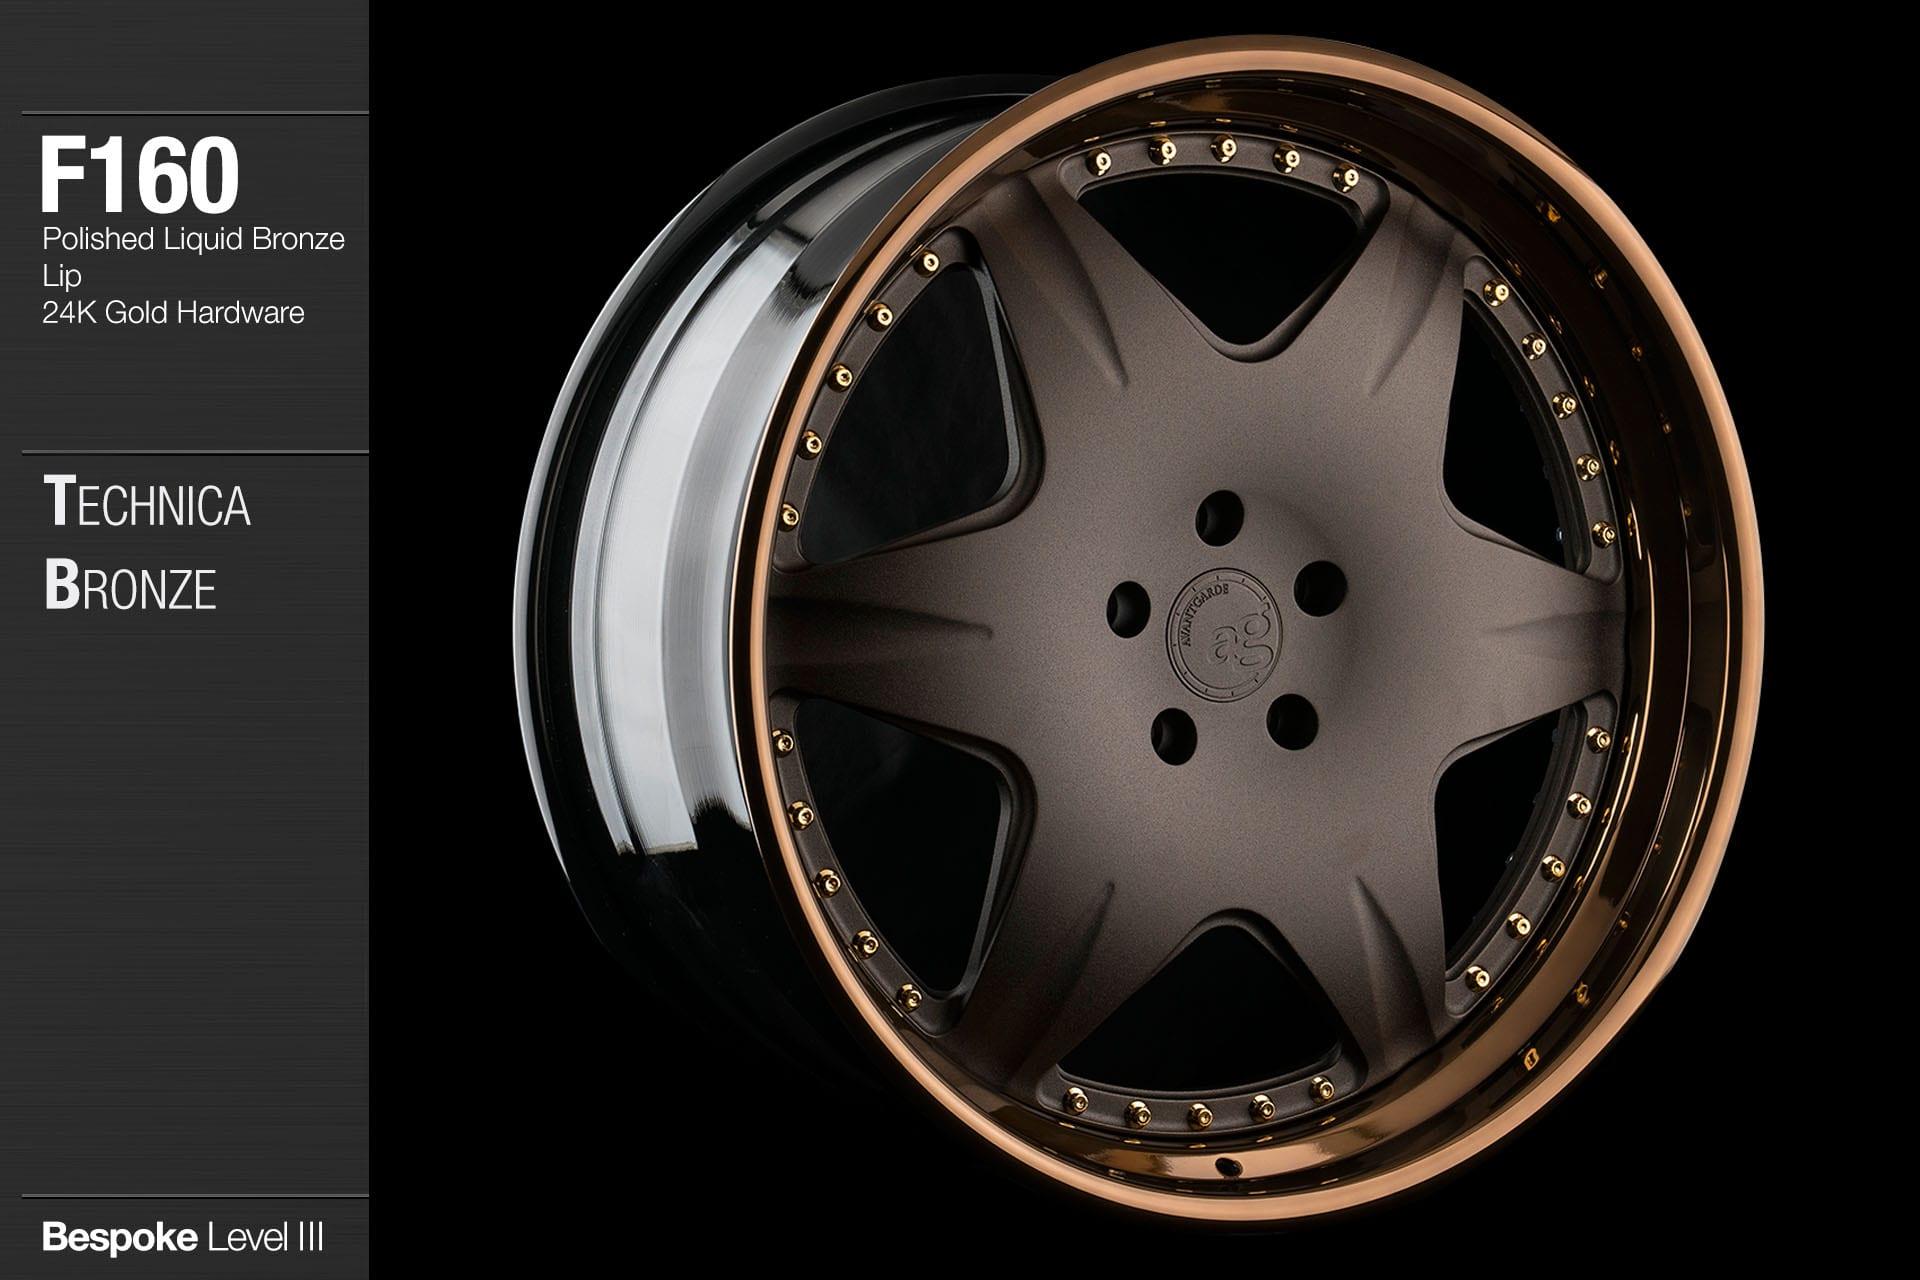 agwheels ag wheel wheels avant garde f160 technica bronze polished liquid bronze lip 24kt gold hardware forged wheels forge 3piece 3 piece 19inch 20inch